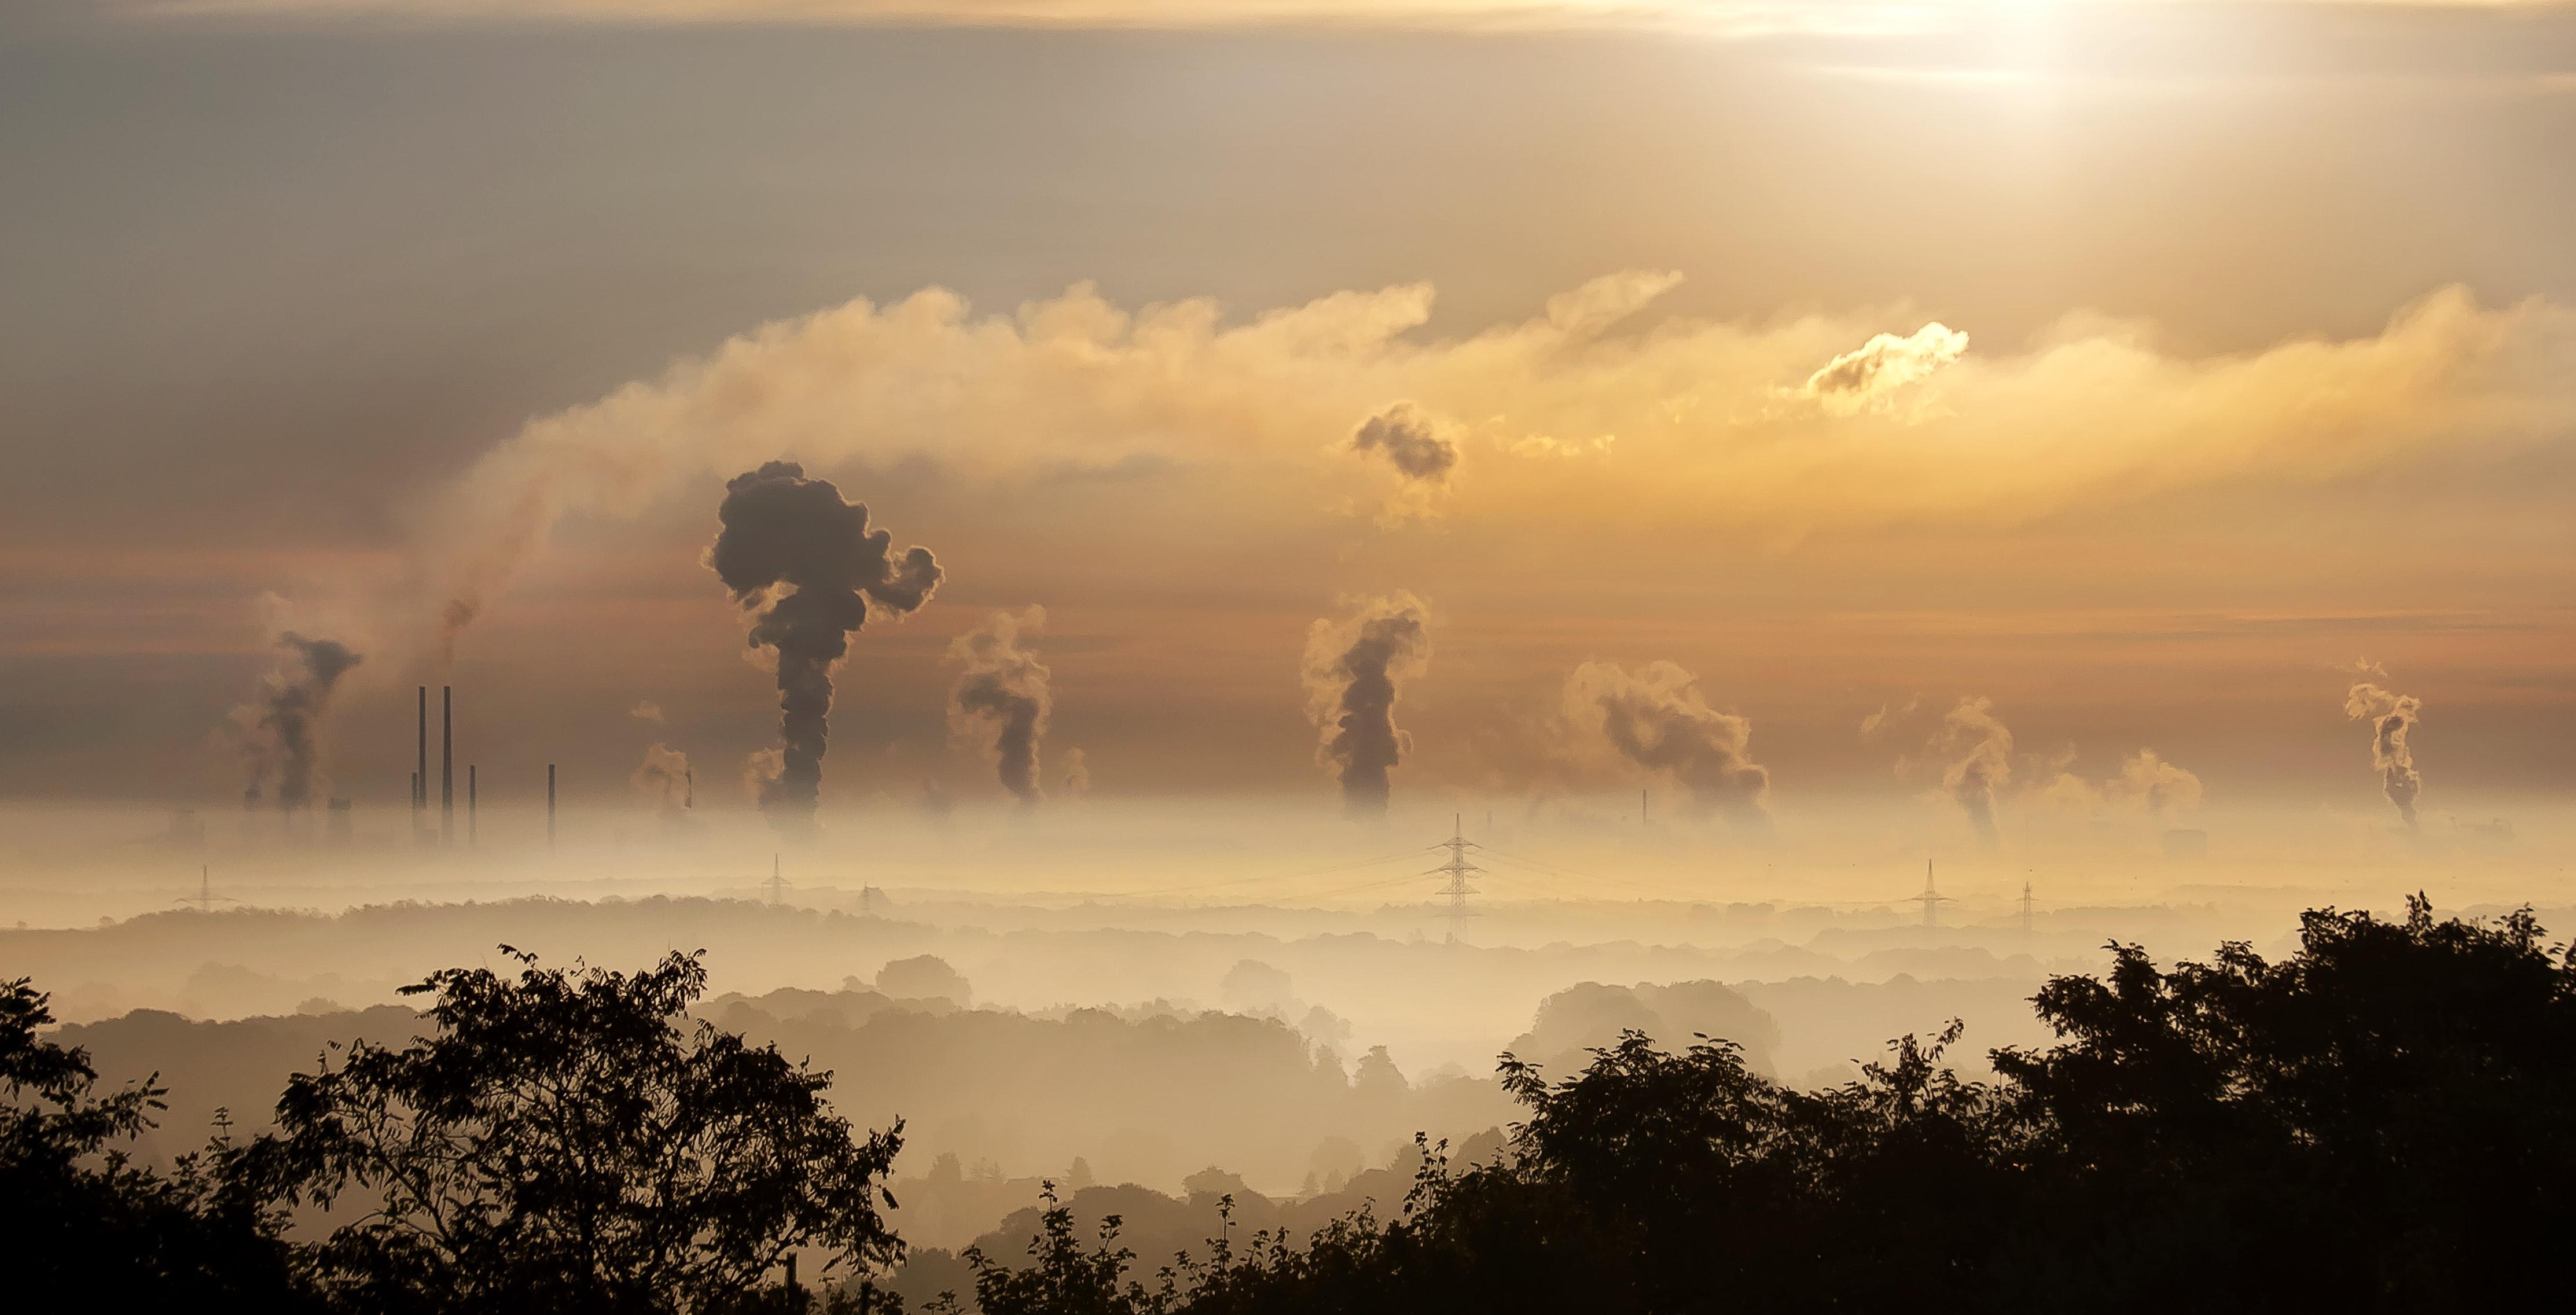 carbon-chimney-clouds-39553-Pexels